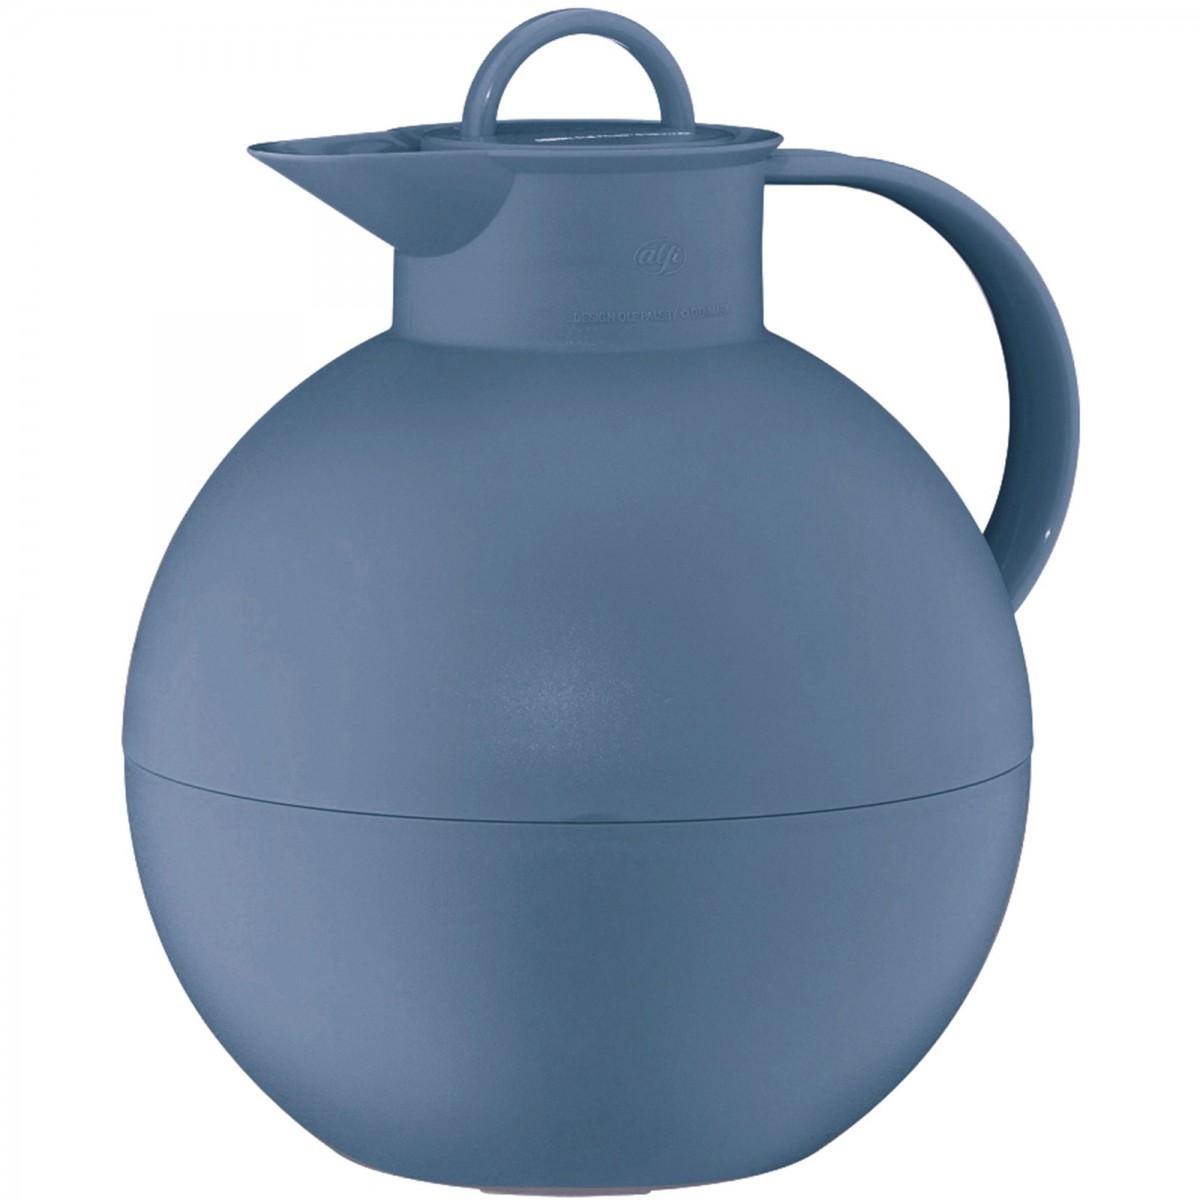 ALFI Kugle termokande indigo blå frosted 1 ltr.